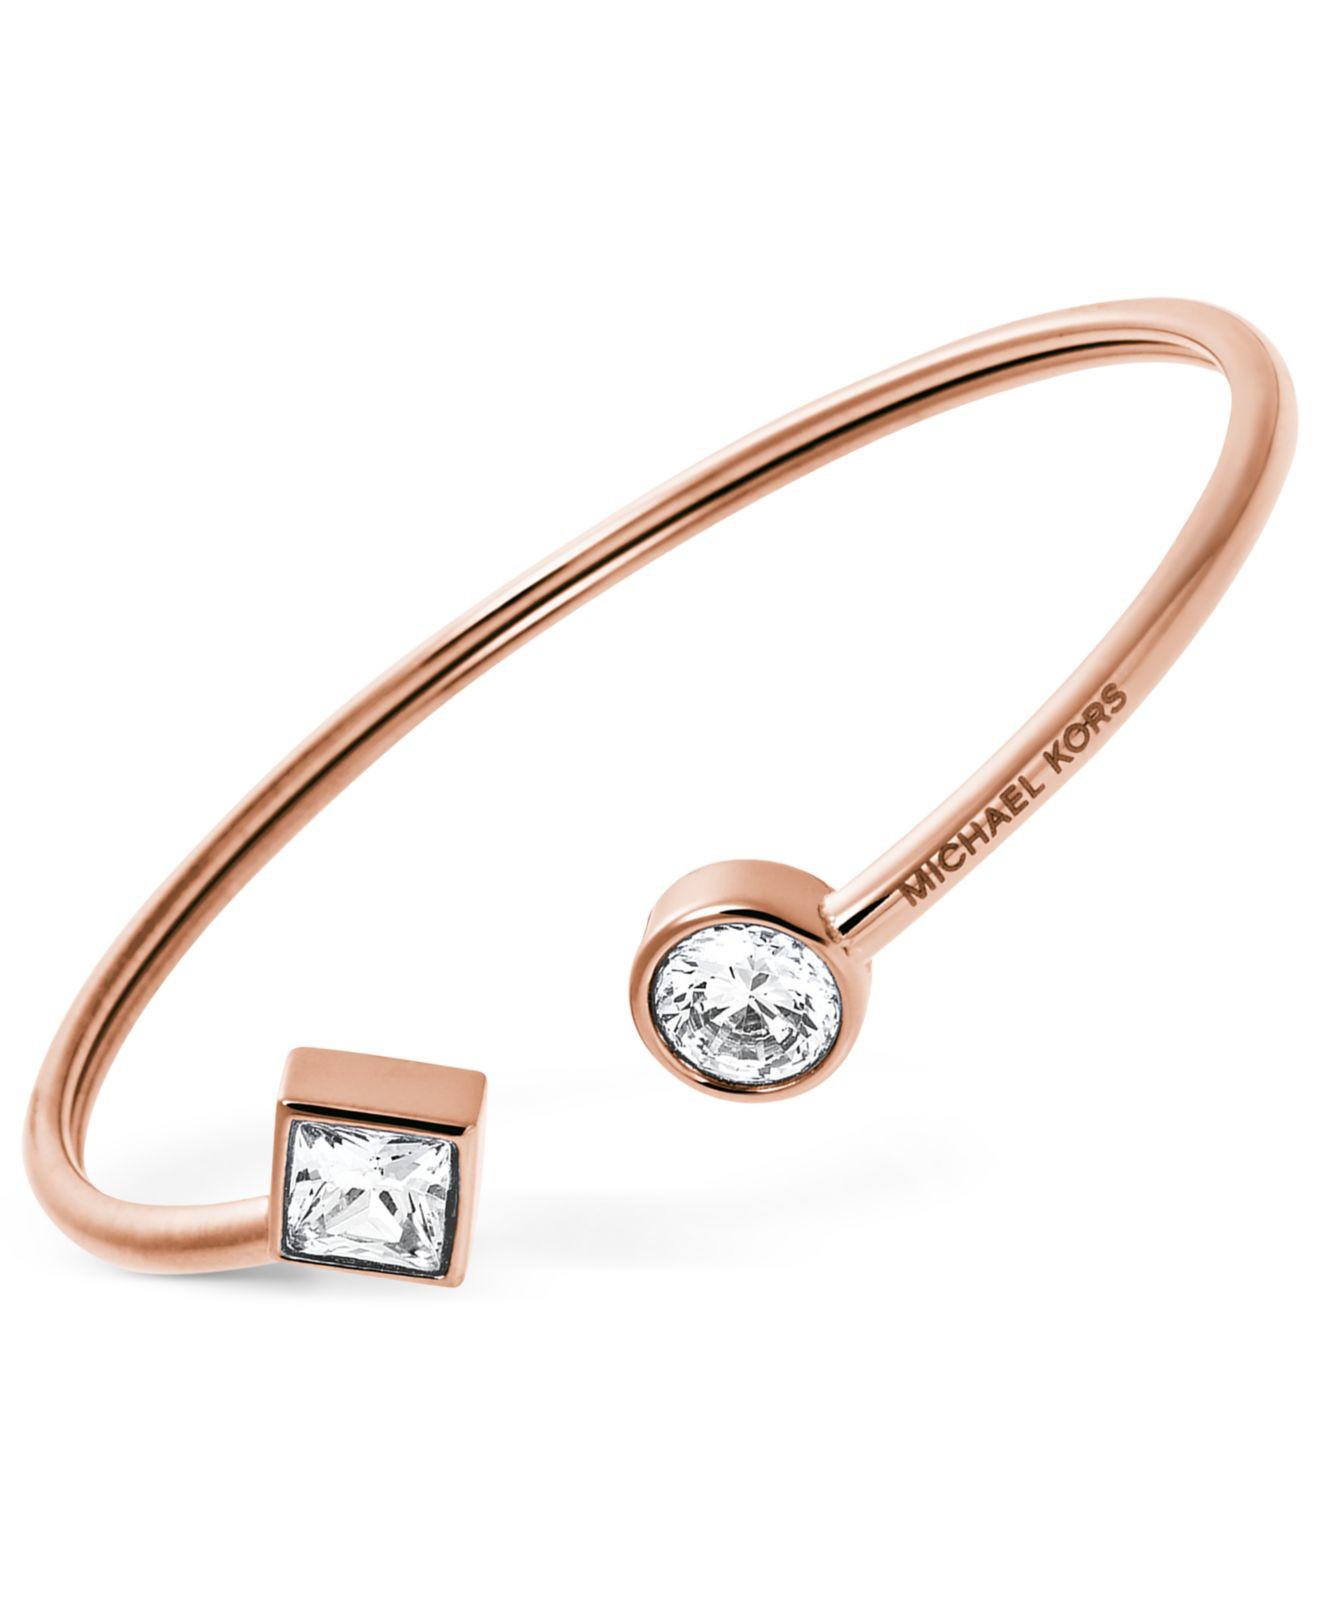 michael kors flexible open cuff bracelet in metallic lyst. Black Bedroom Furniture Sets. Home Design Ideas